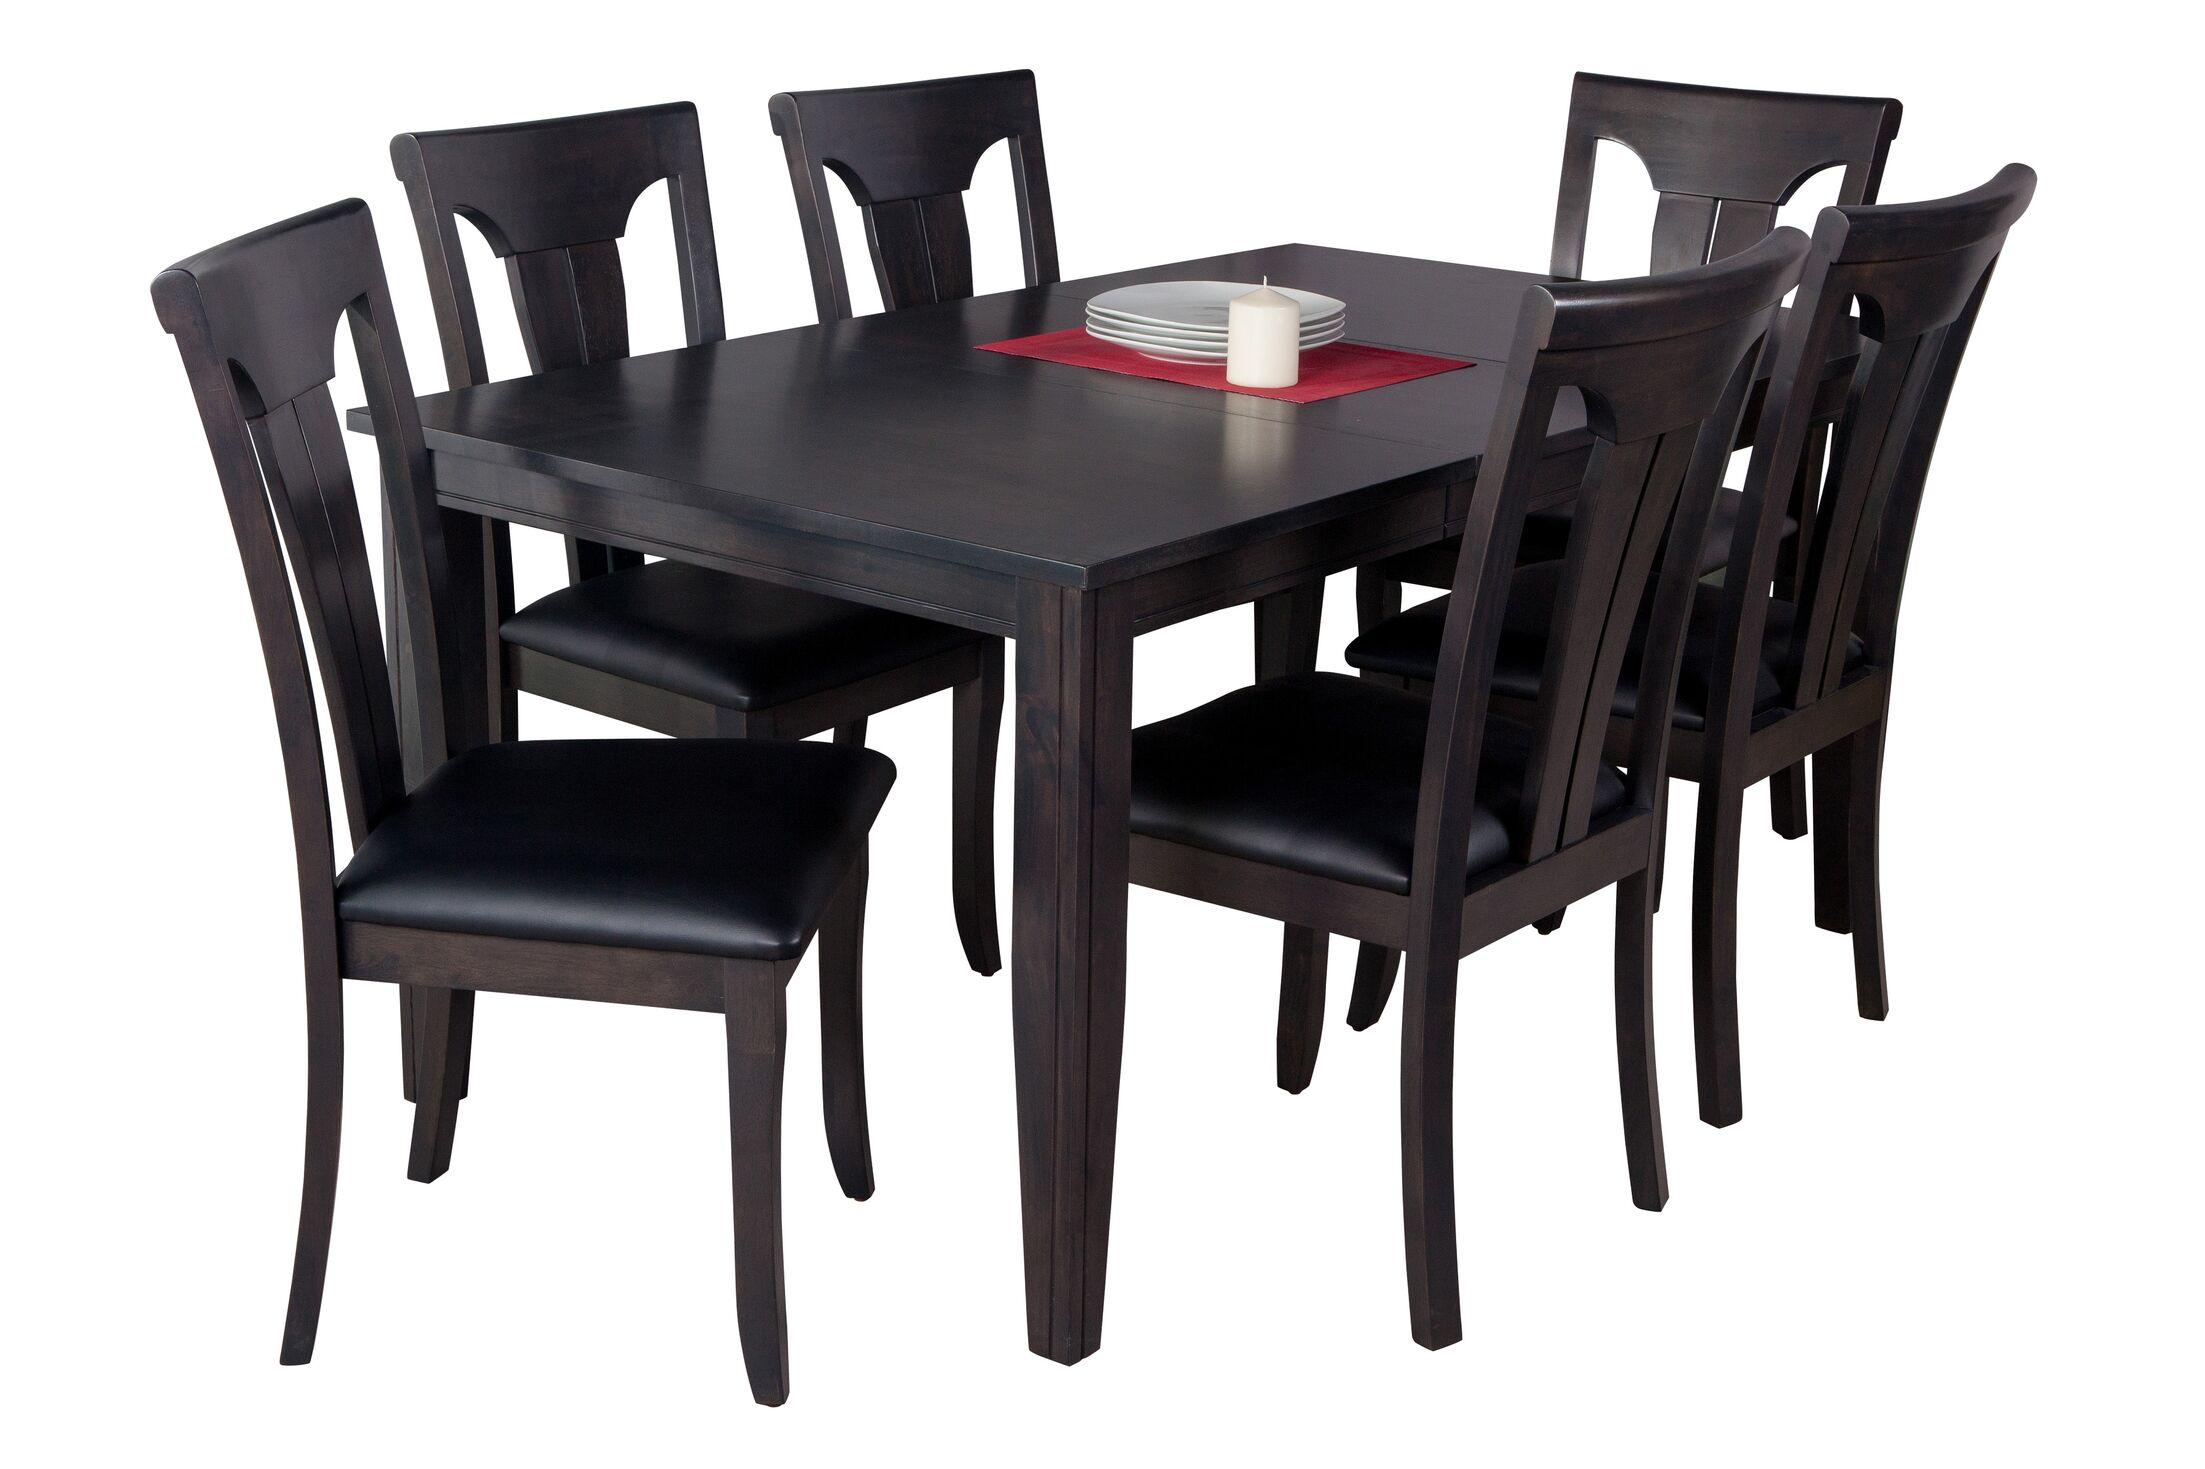 Haan 7 Piece Solid Wood Dining Set Color: Dark Gray